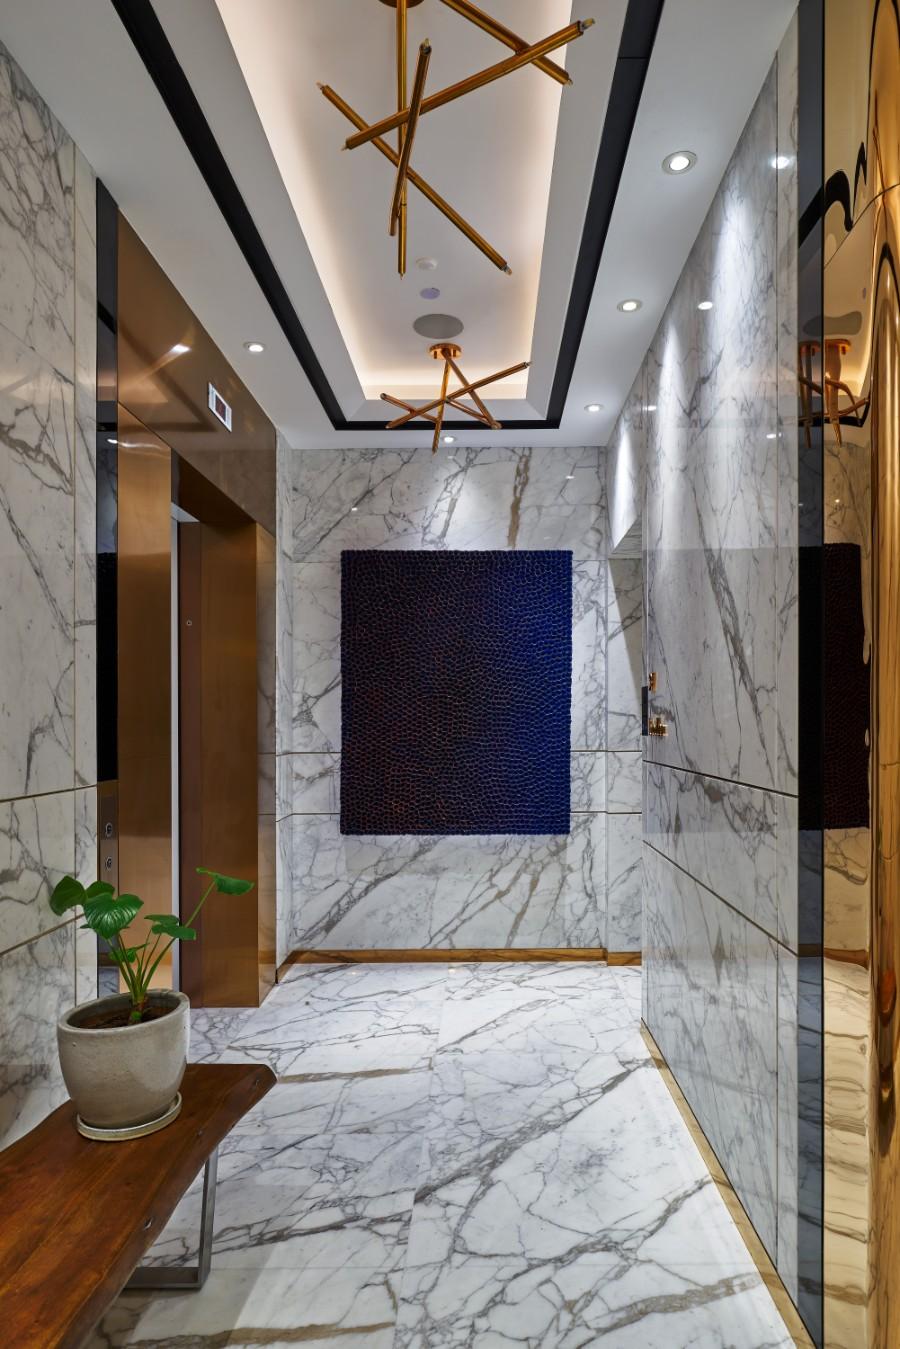 exclusive design Exclusive Design: Altamount Residence by Hirsch Bedner Associates Inside Altamount Residence by Hirsch Bedner Associates 23